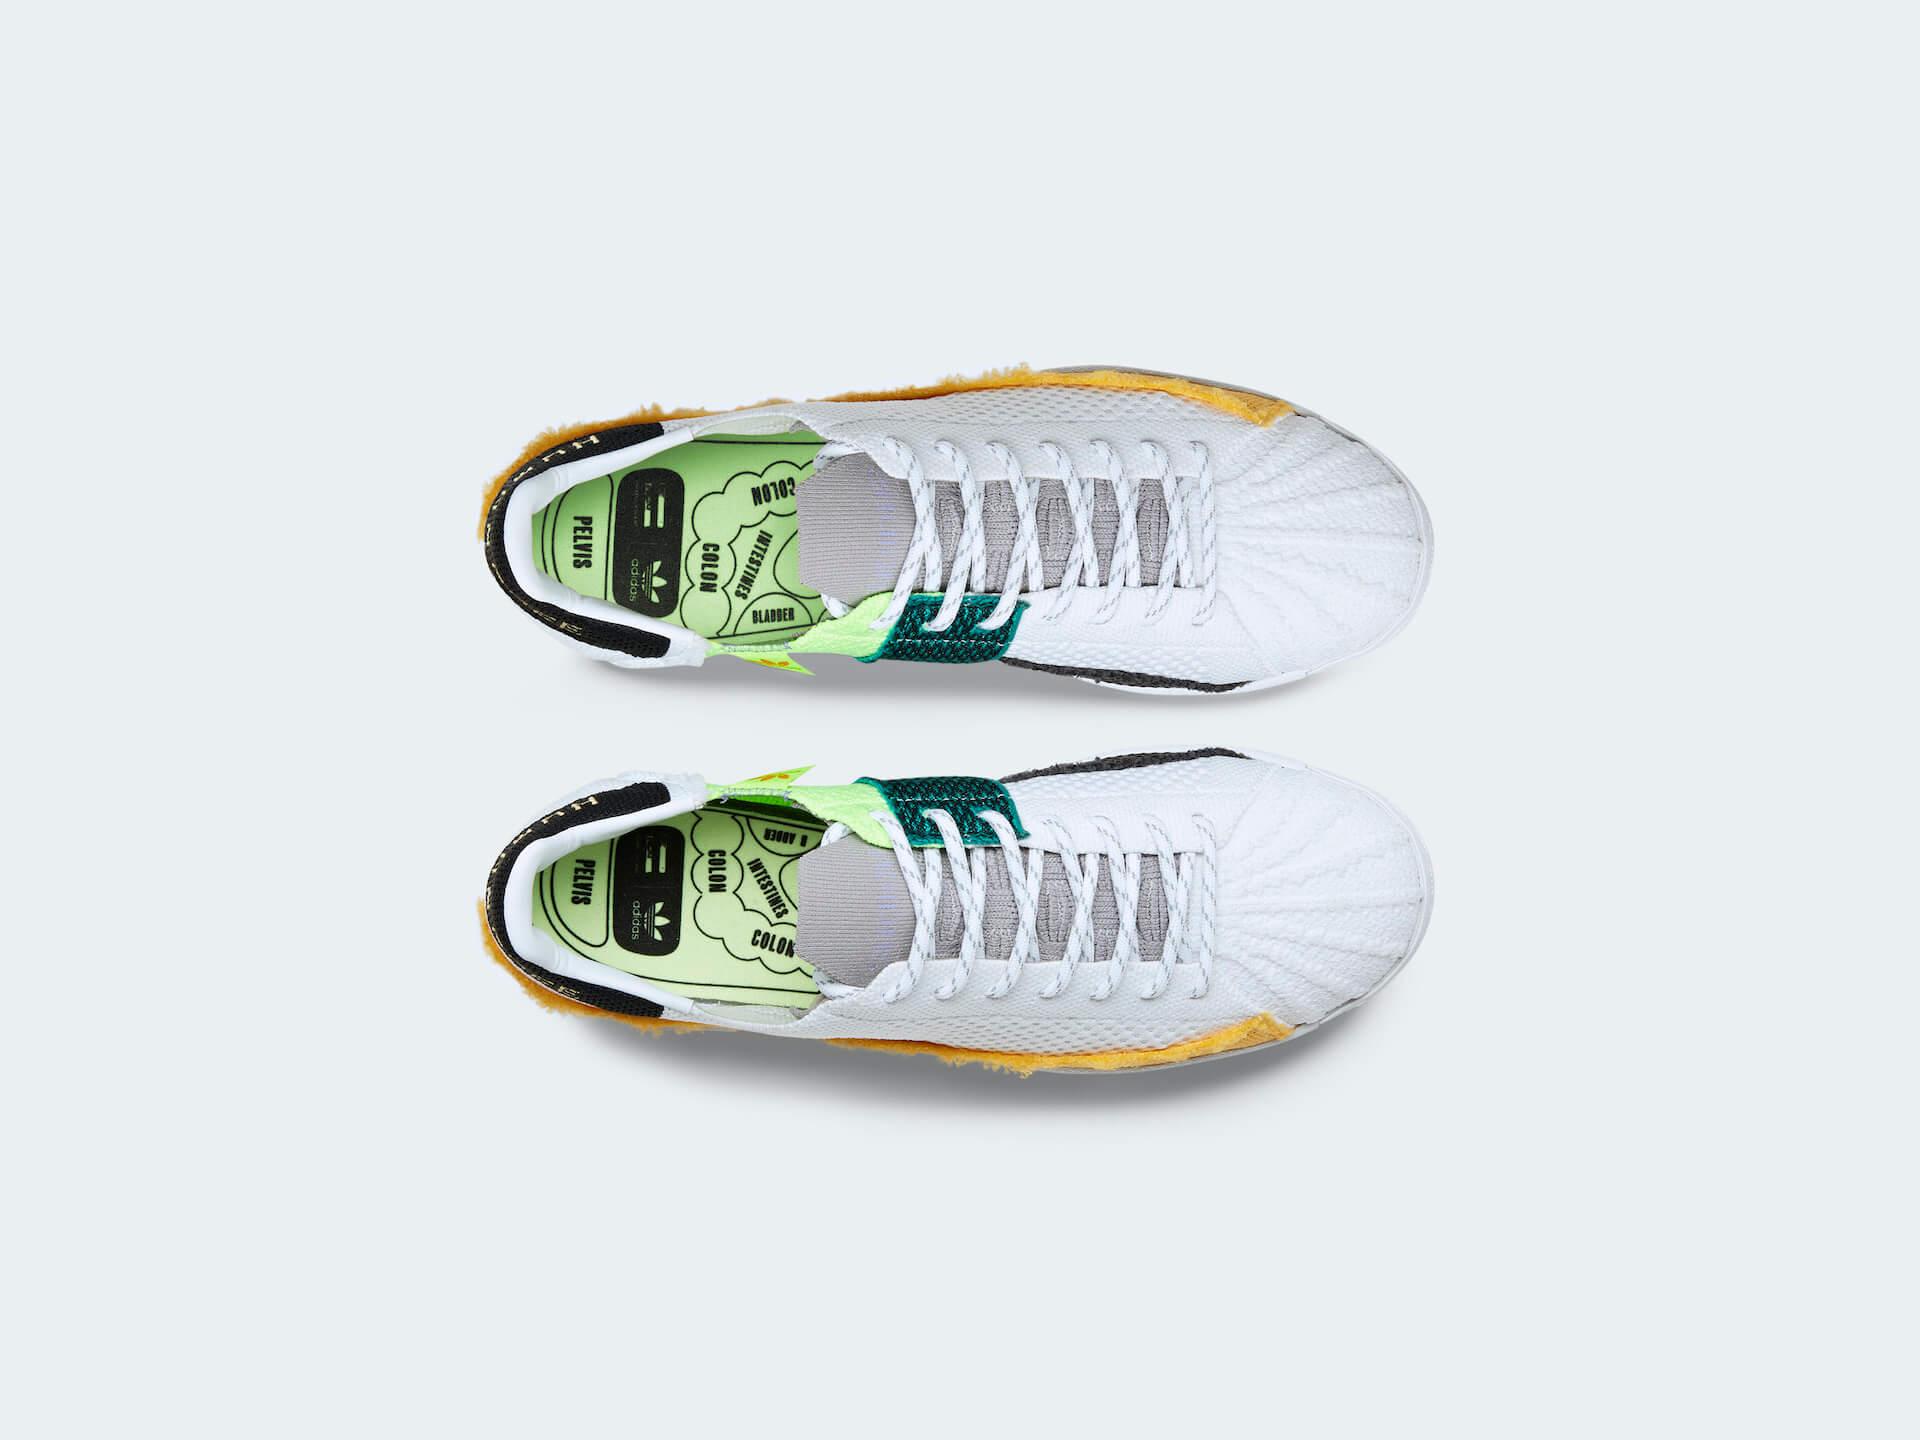 adidas Originalsとファレル・ウィリアムスのコラボ『SUPERSTAR』が登場!パッチワークパネルが目を引くデザイン lf200701_adidasporiginals_pharrelwilliams_05